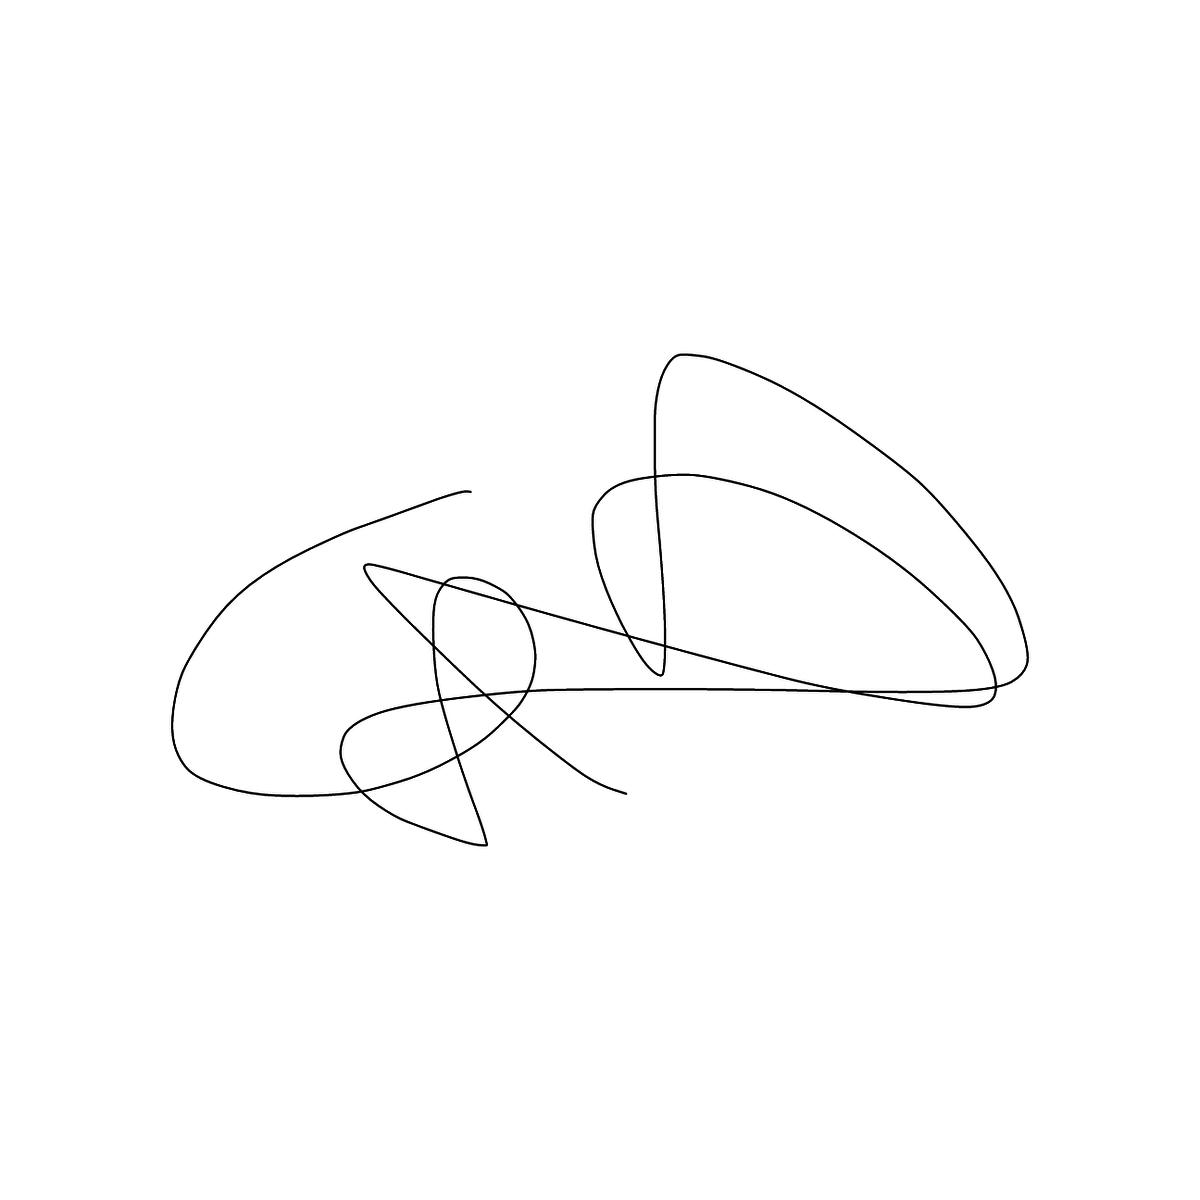 BAAAM drawing#7820 lat:51.0437736511230500lng: 3.7405323982238770